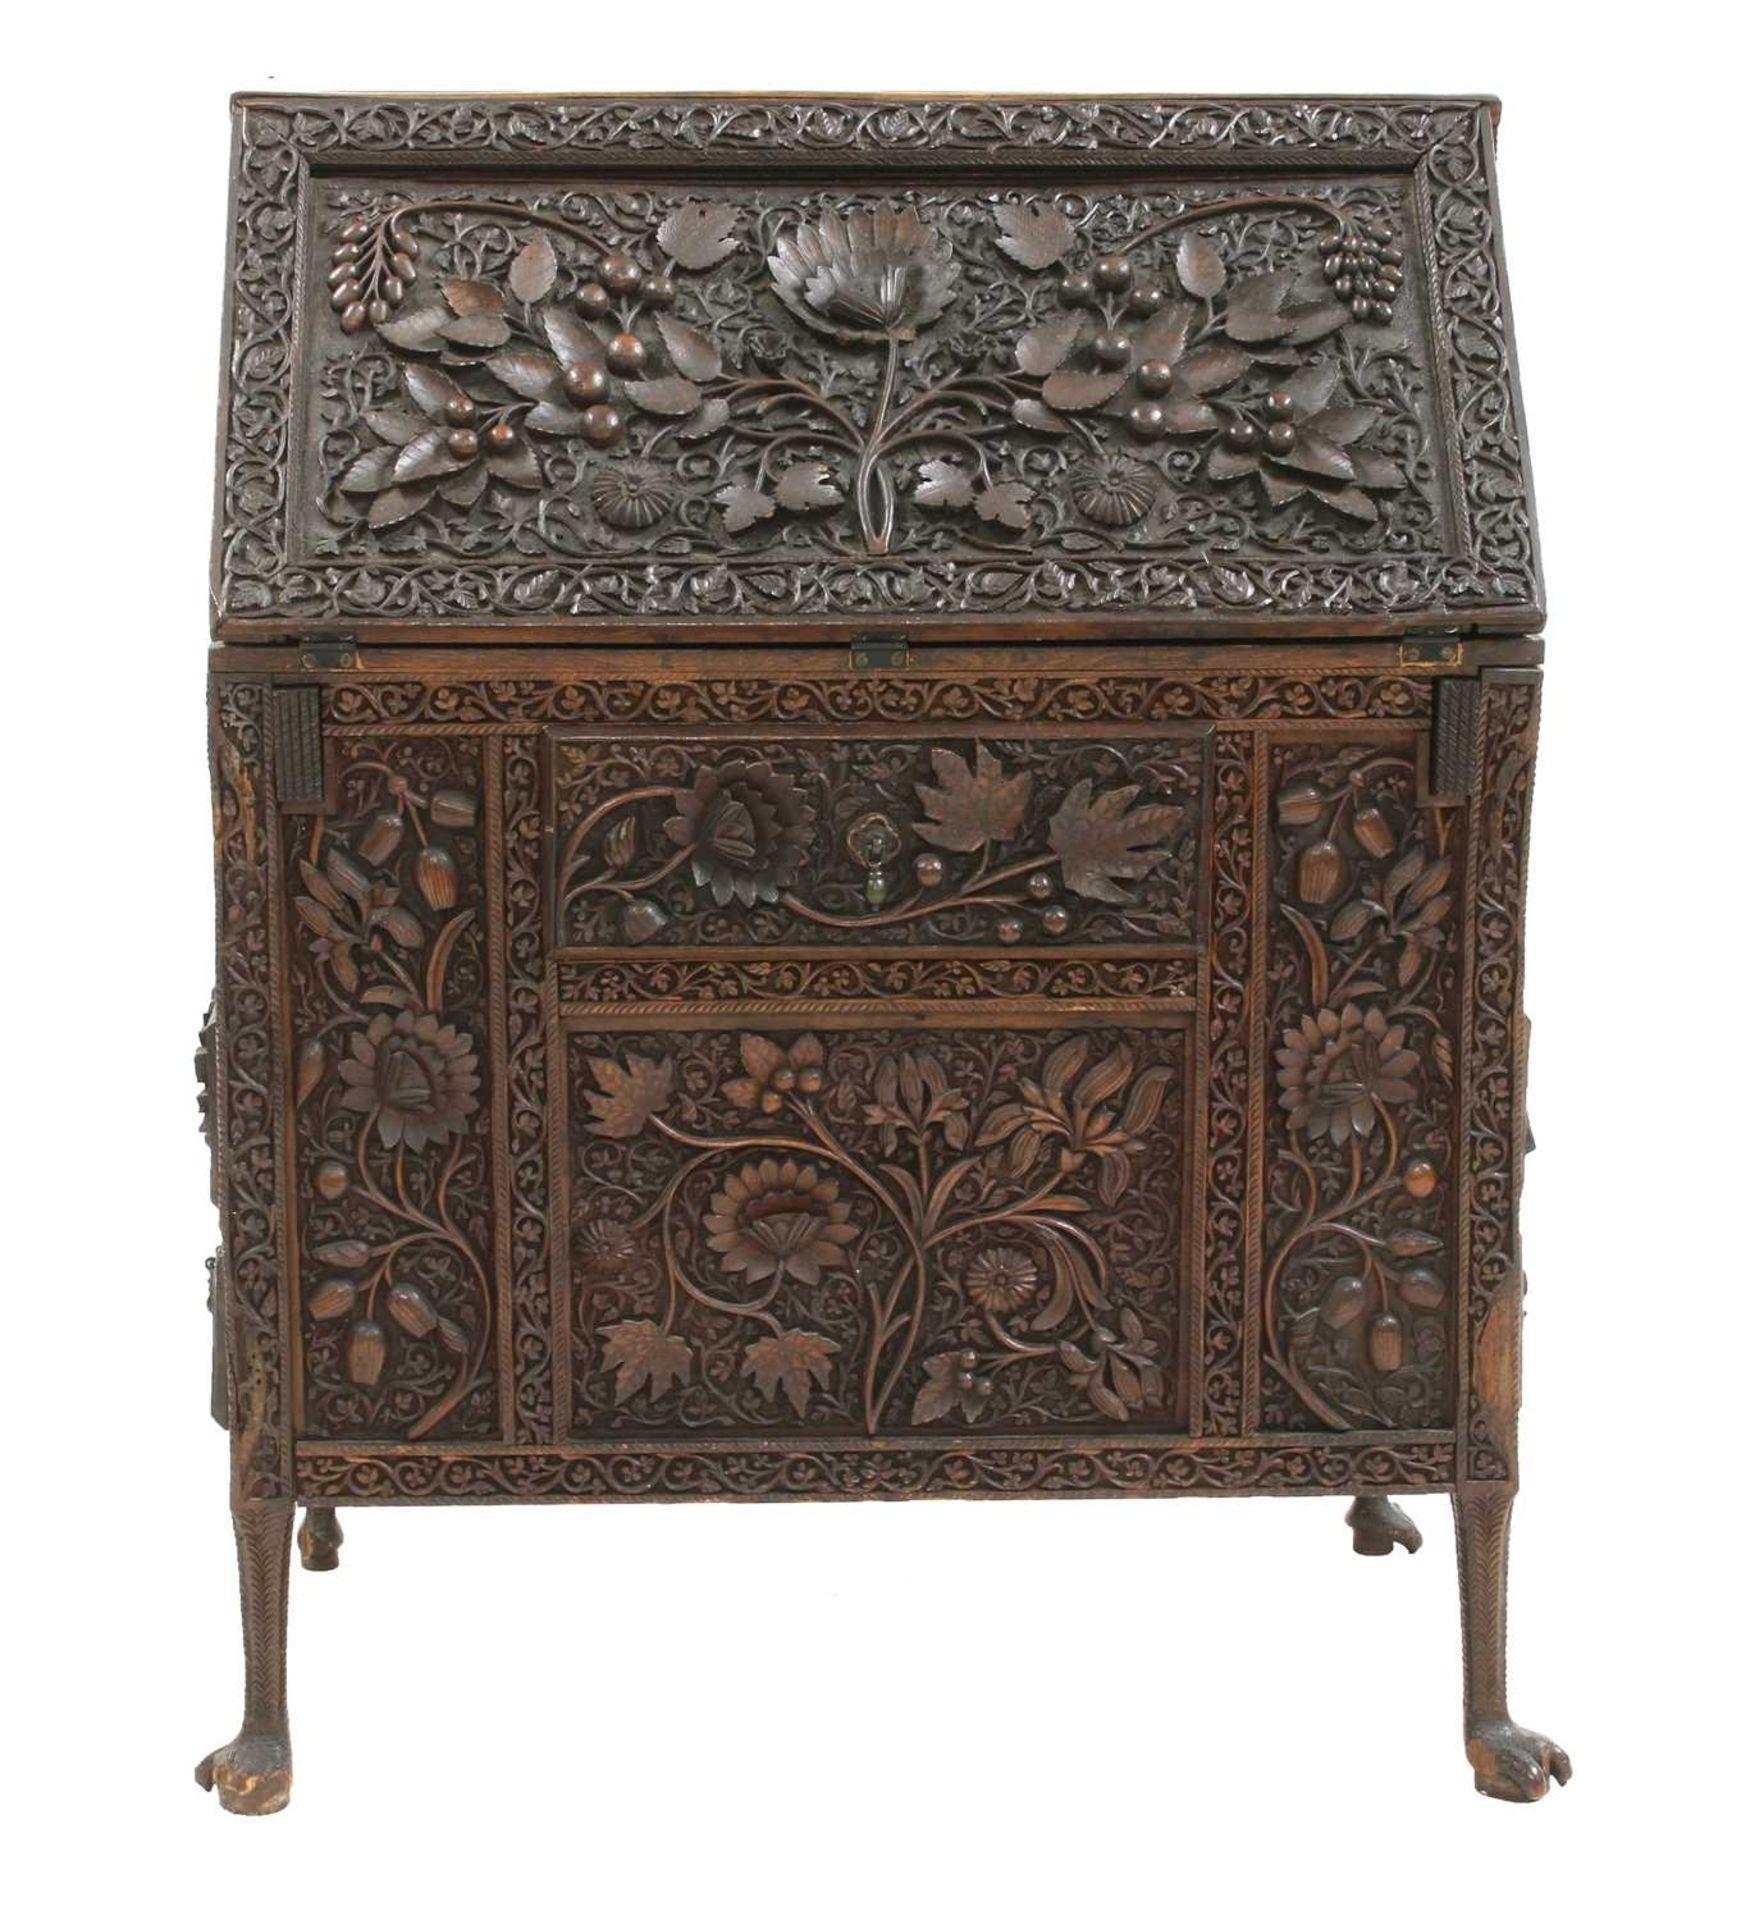 An Anglo-Indian rosewood bureau, - Image 2 of 10